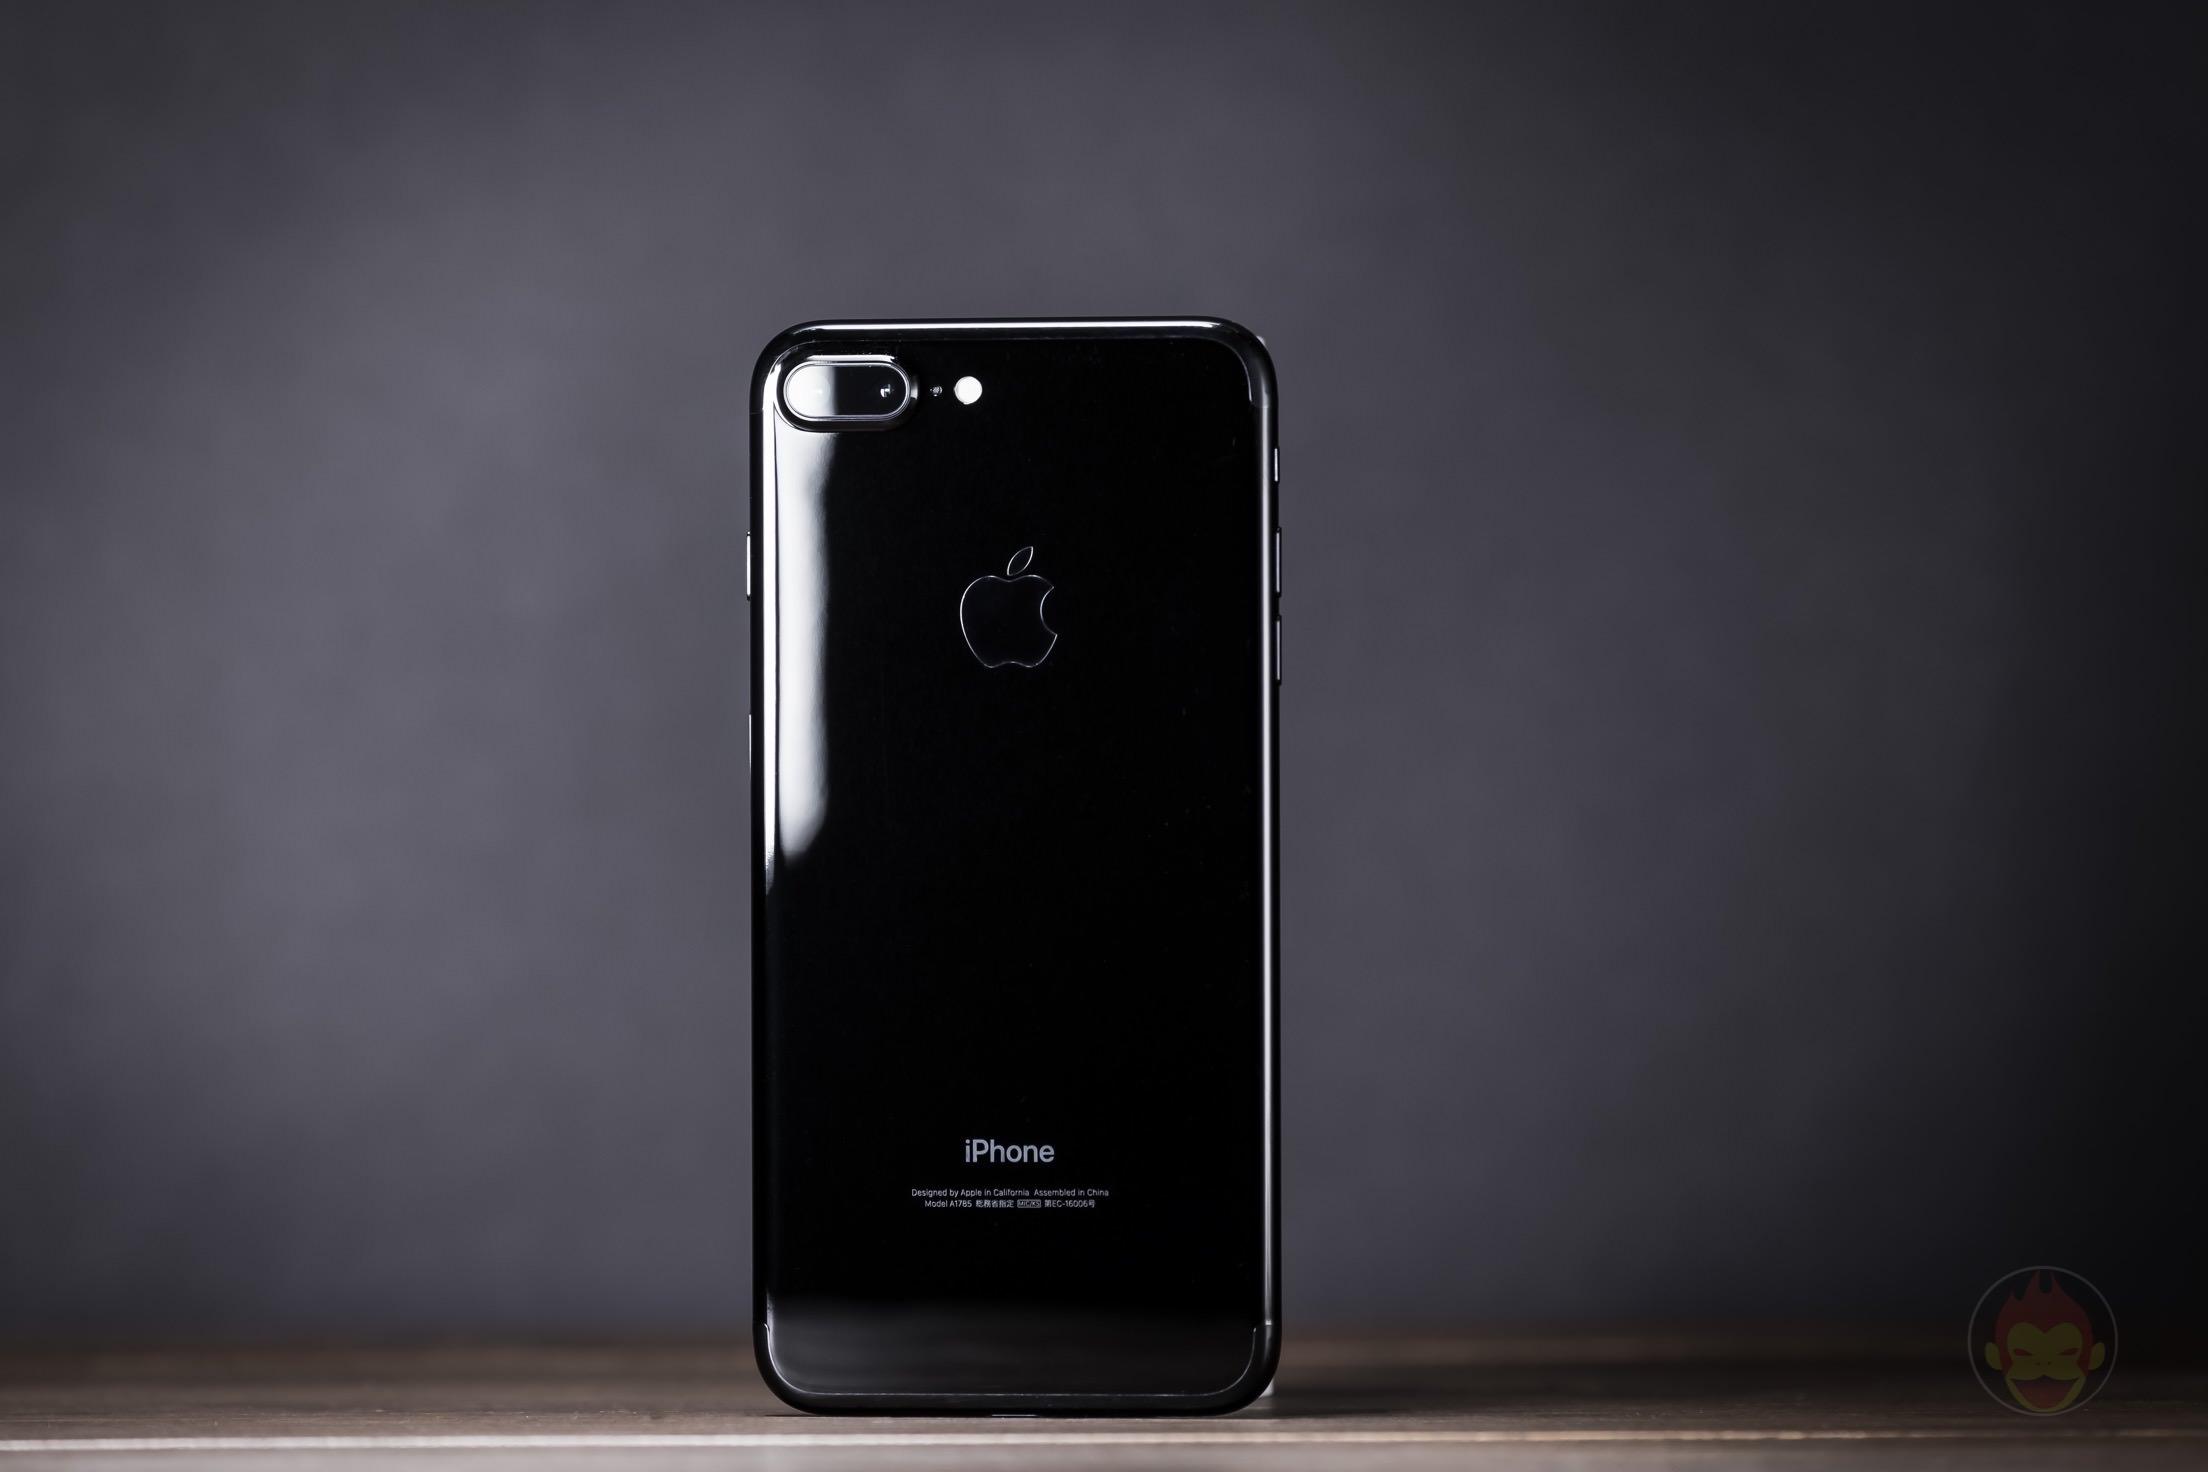 iPhone-7-Plus-Jet-Black-Design-review-08.jpg